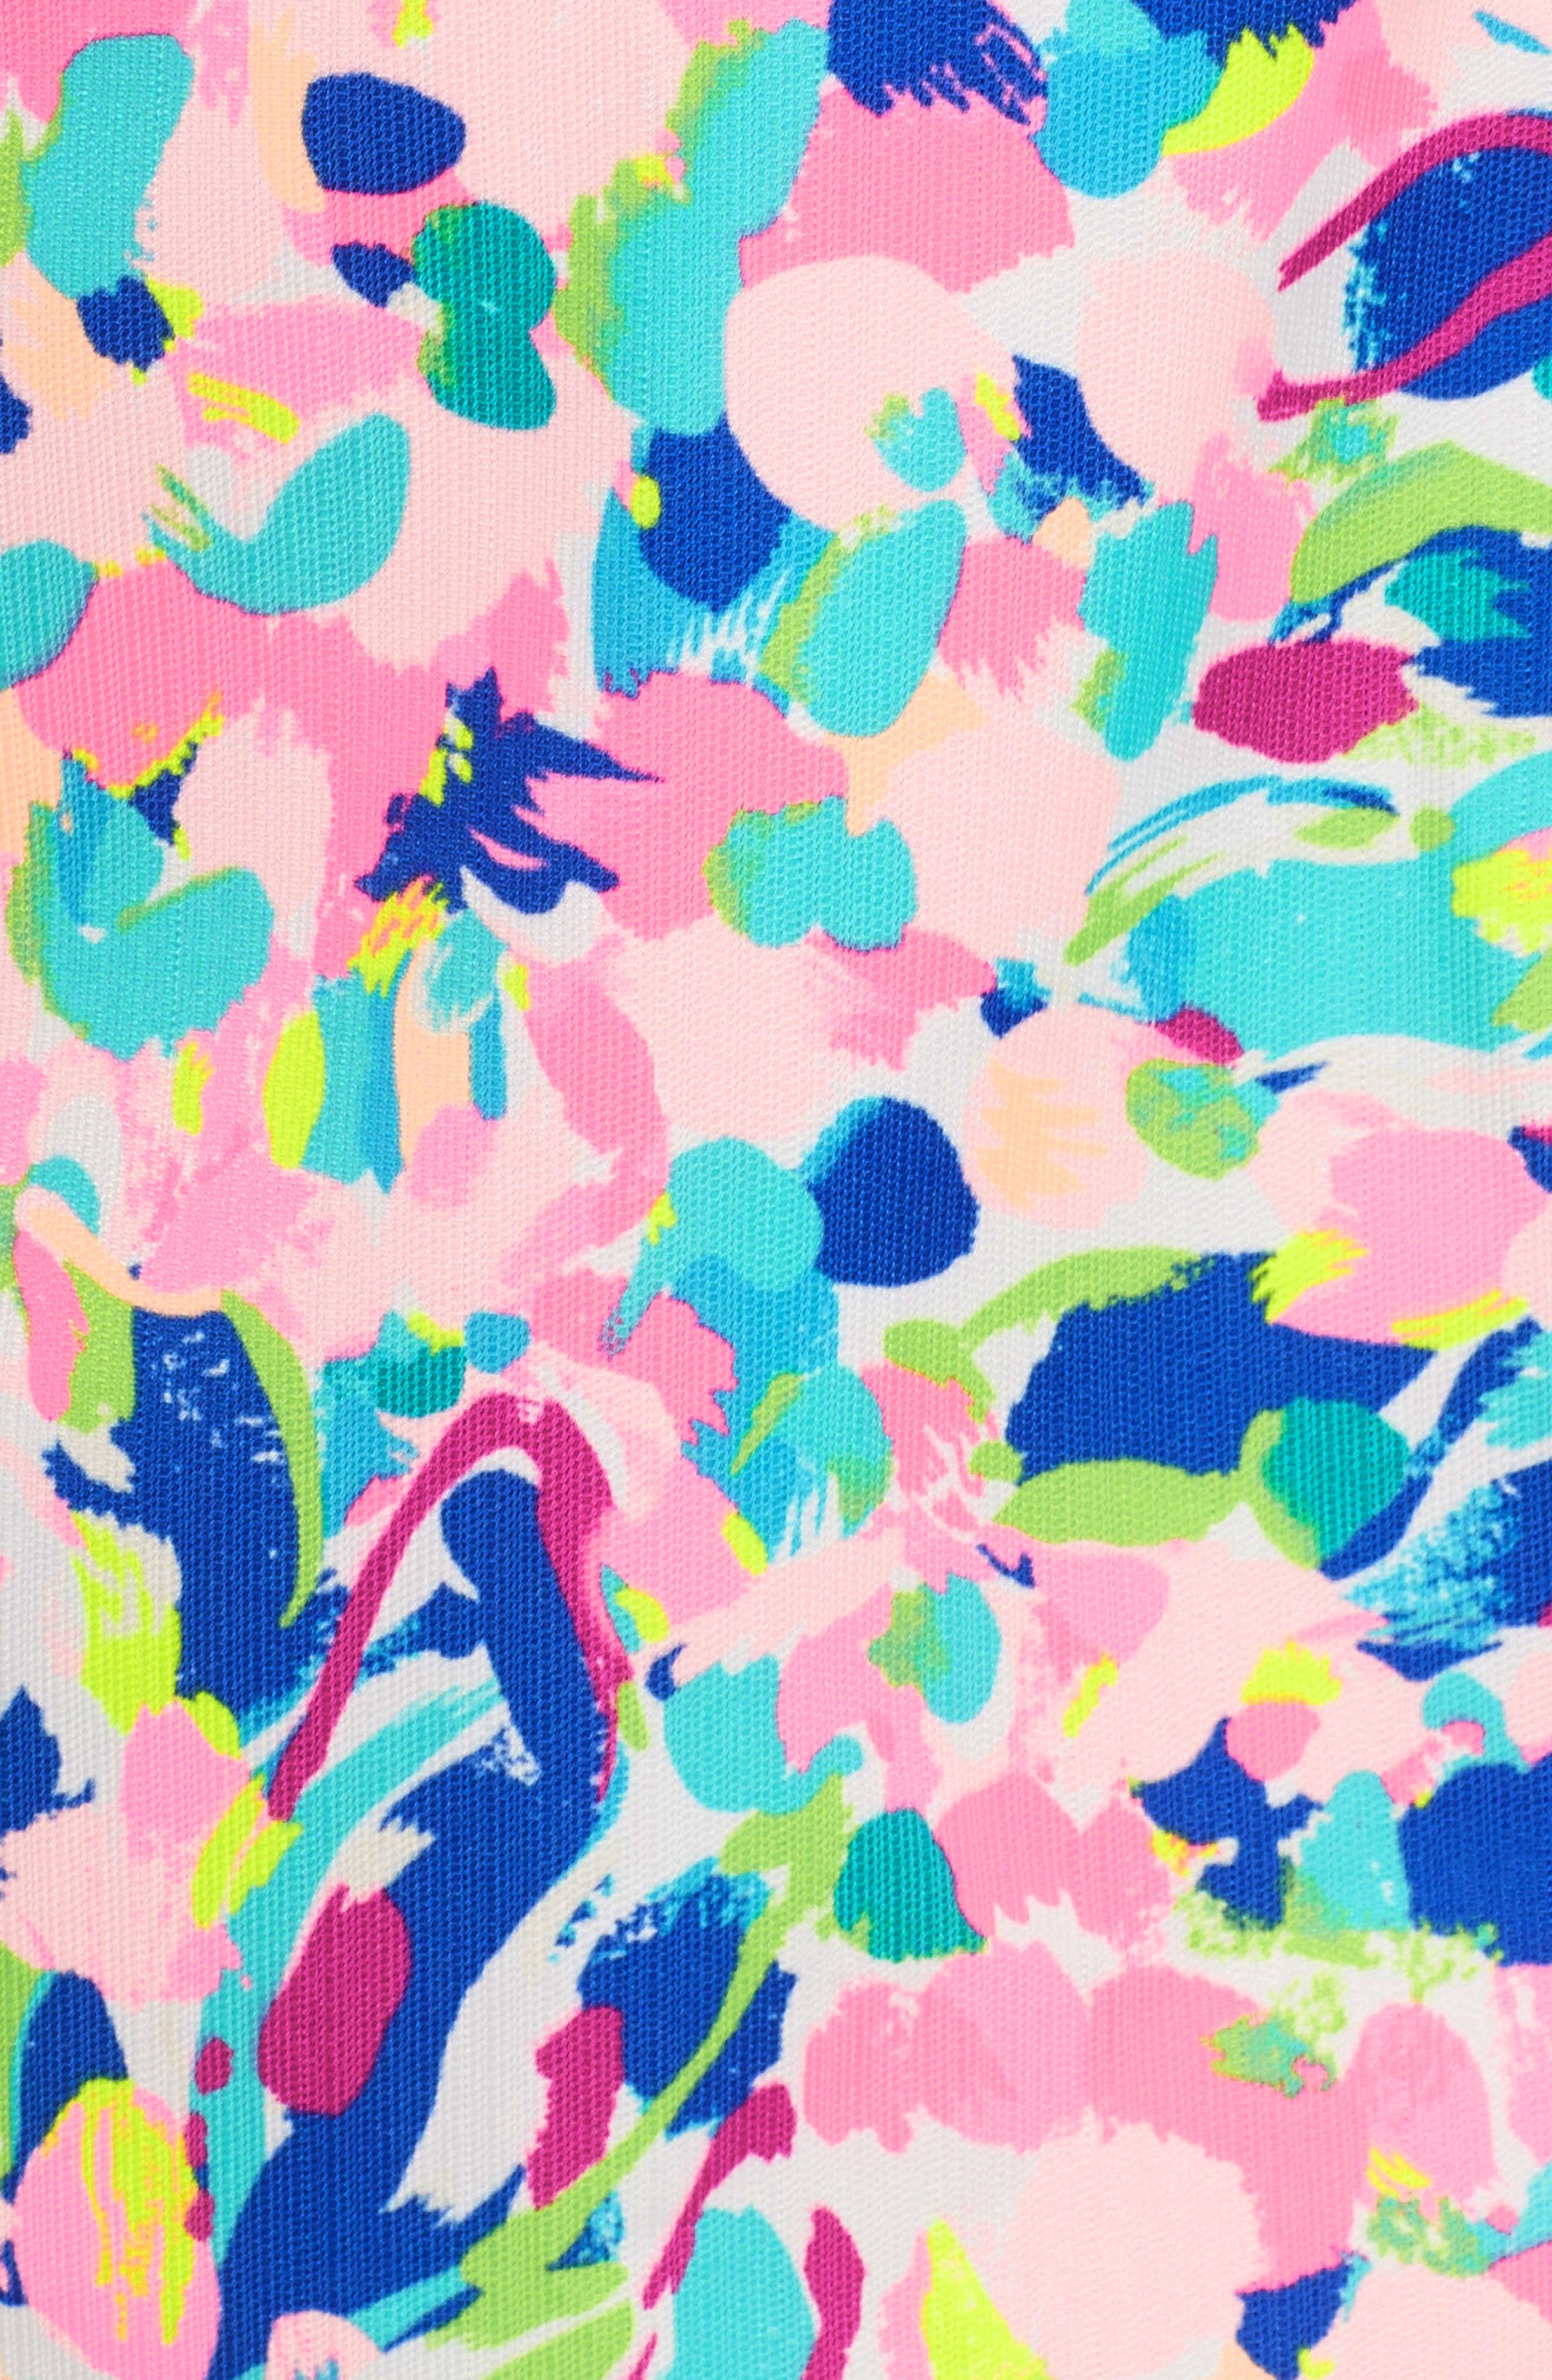 Cabrey Sheath Dress,                             Alternate thumbnail 5, color,                             Multi Pina Colada Club